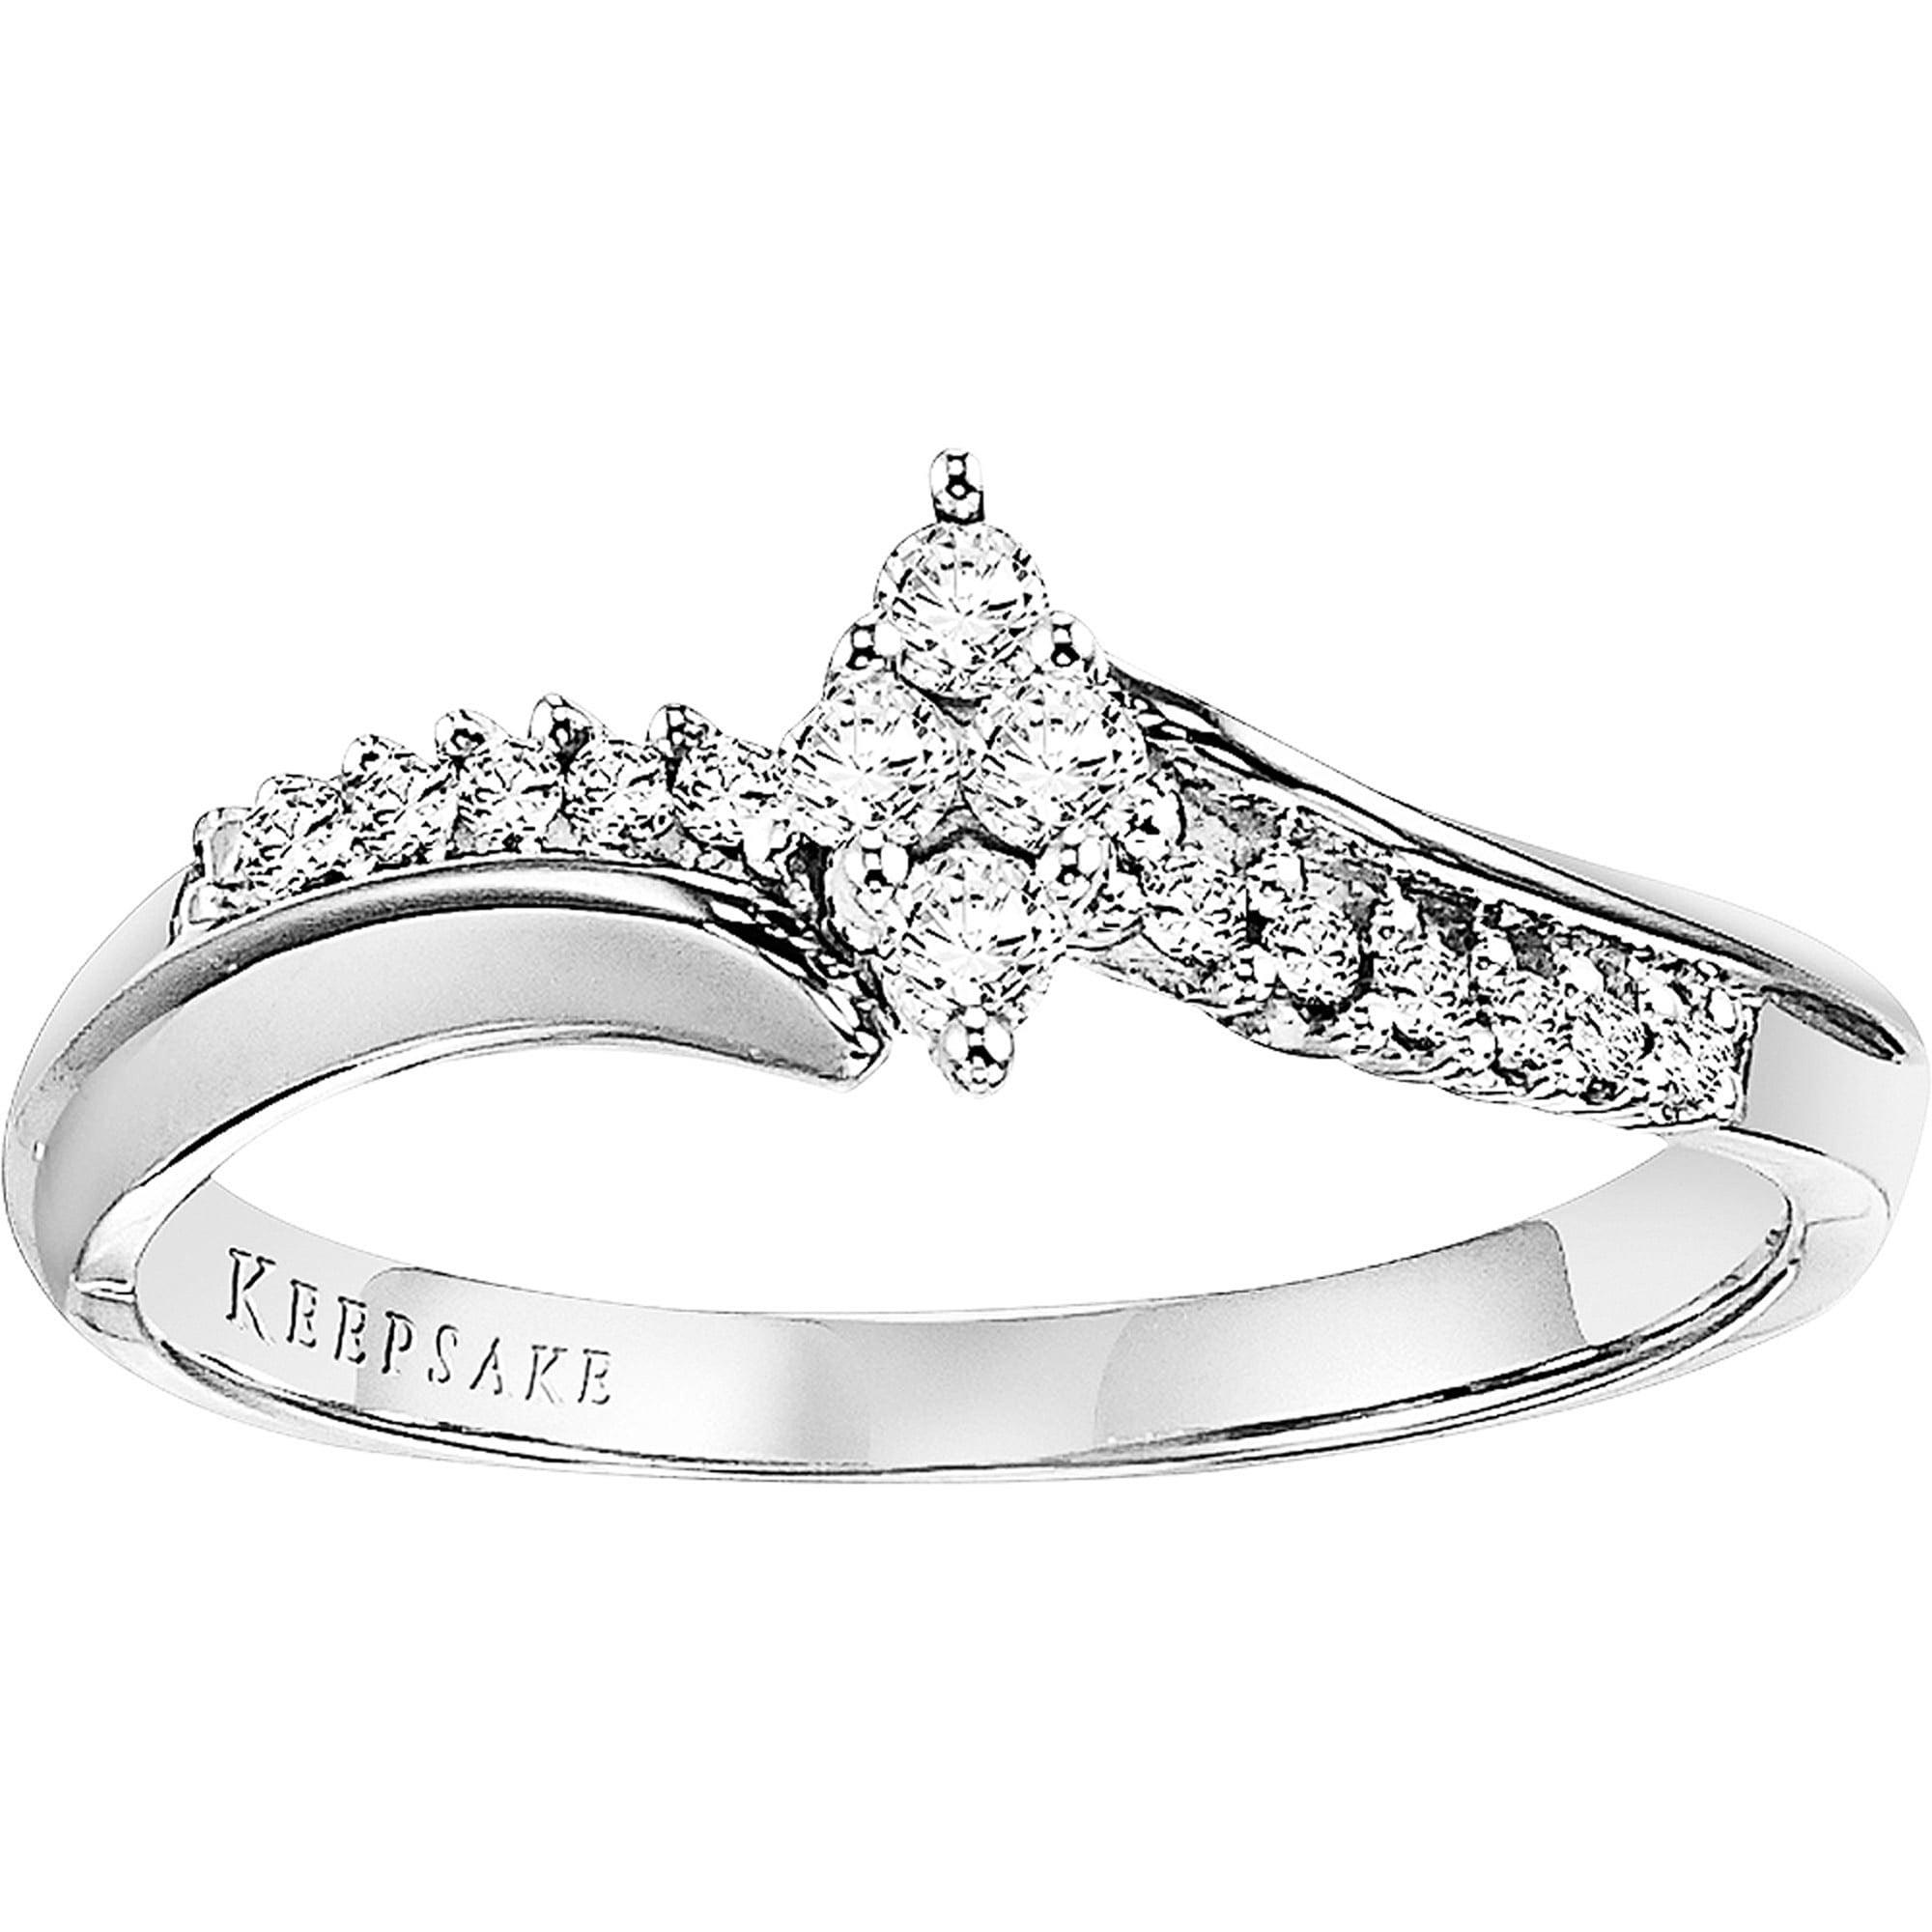 Keepsake Silhouette 1/6 CT. T.W. Diamond 10kt White Gold Ring